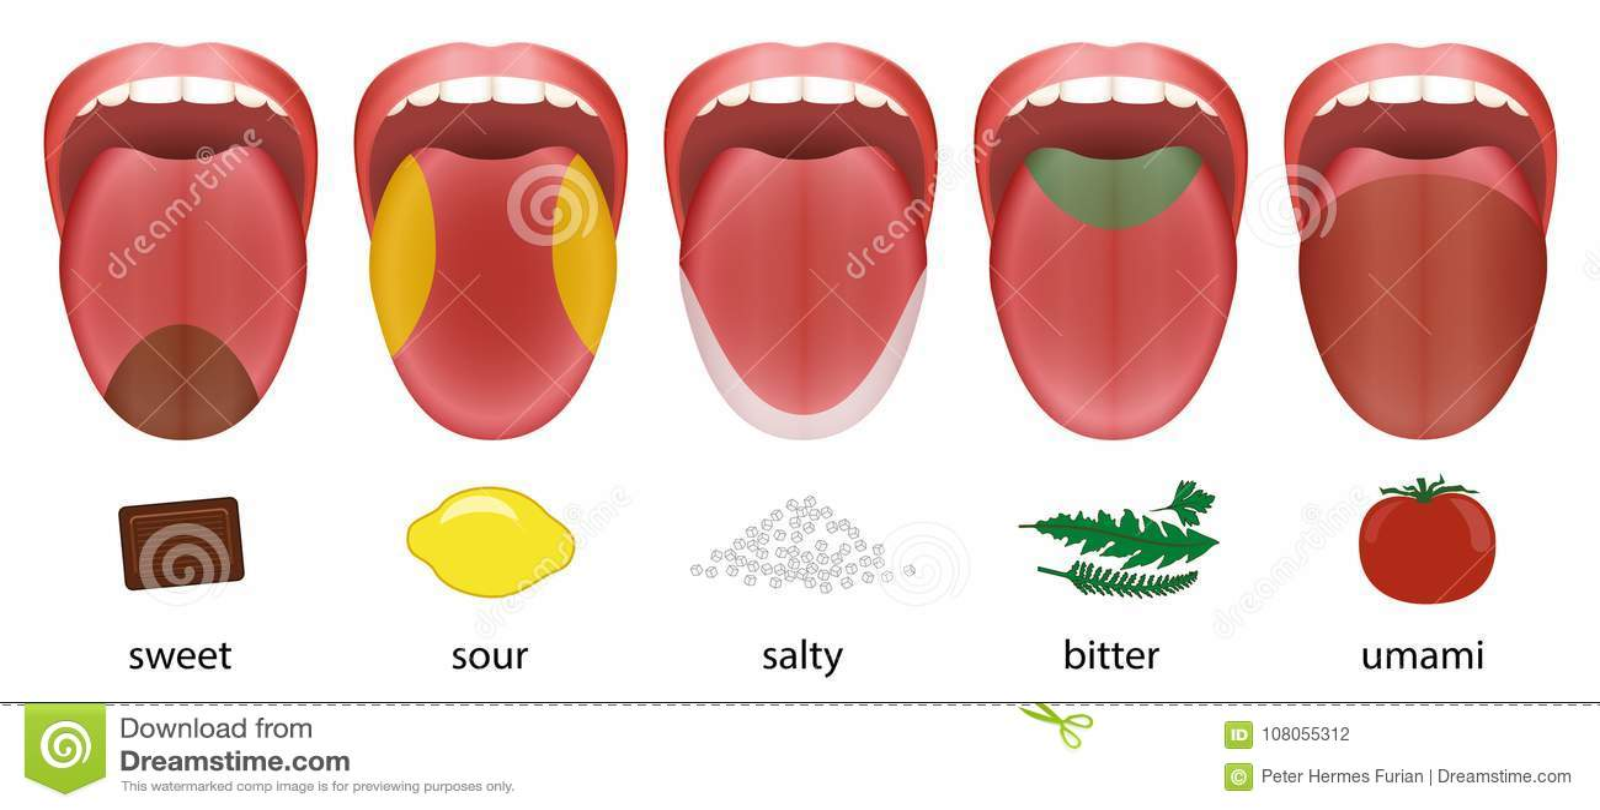 Tongue Taste Areas Sweet Sour Salty Bitter Umami